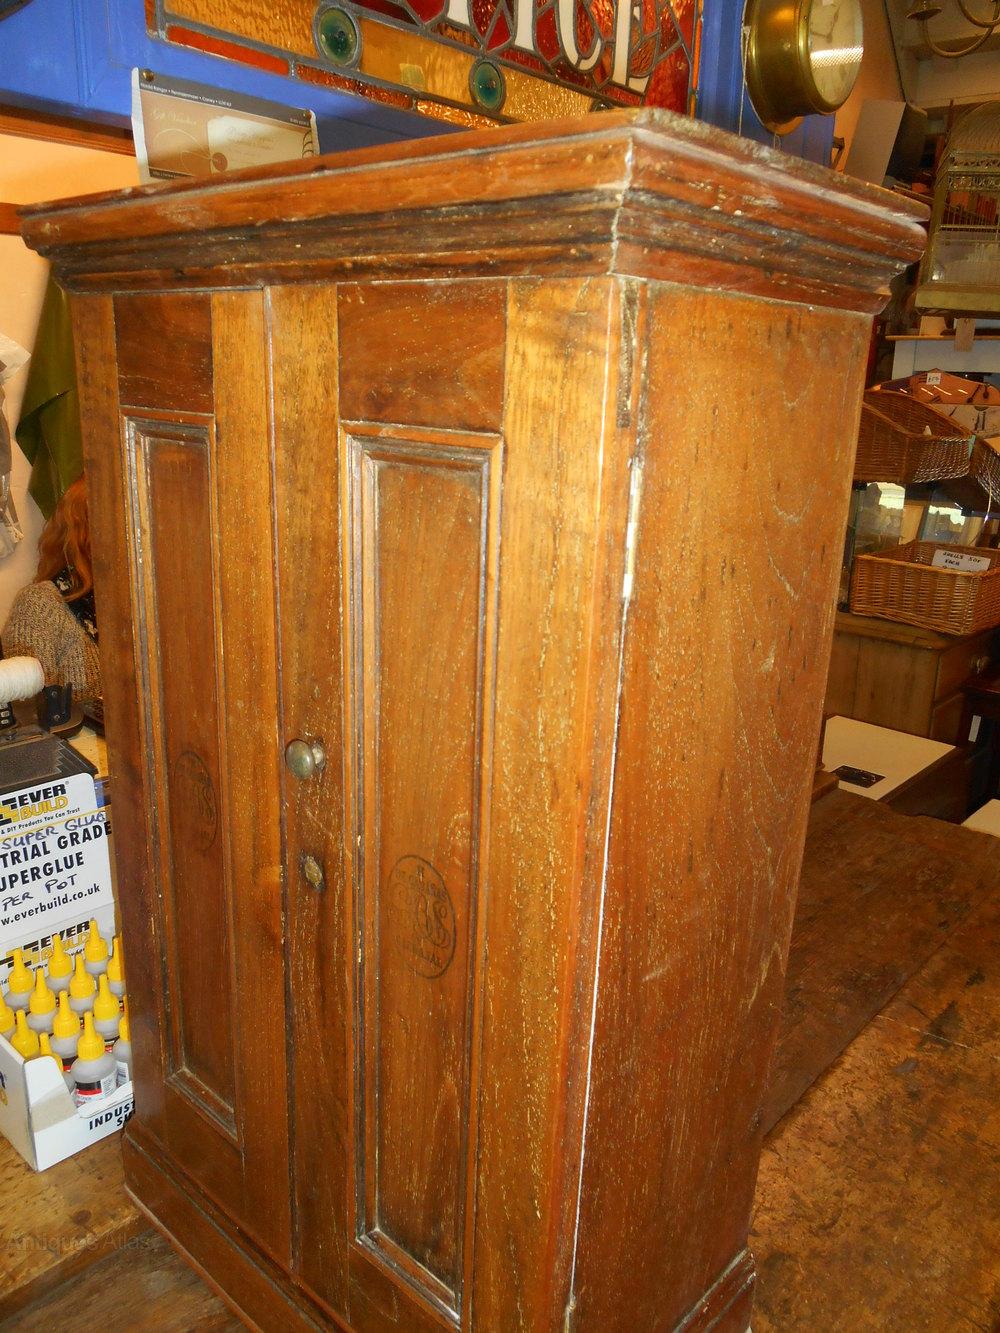 Antique Cigar/Medicine Cabinet Antique Medicine Cabinets %%alt5%% - Antique Cigar/Medicine Cabinet - Antiques Atlas